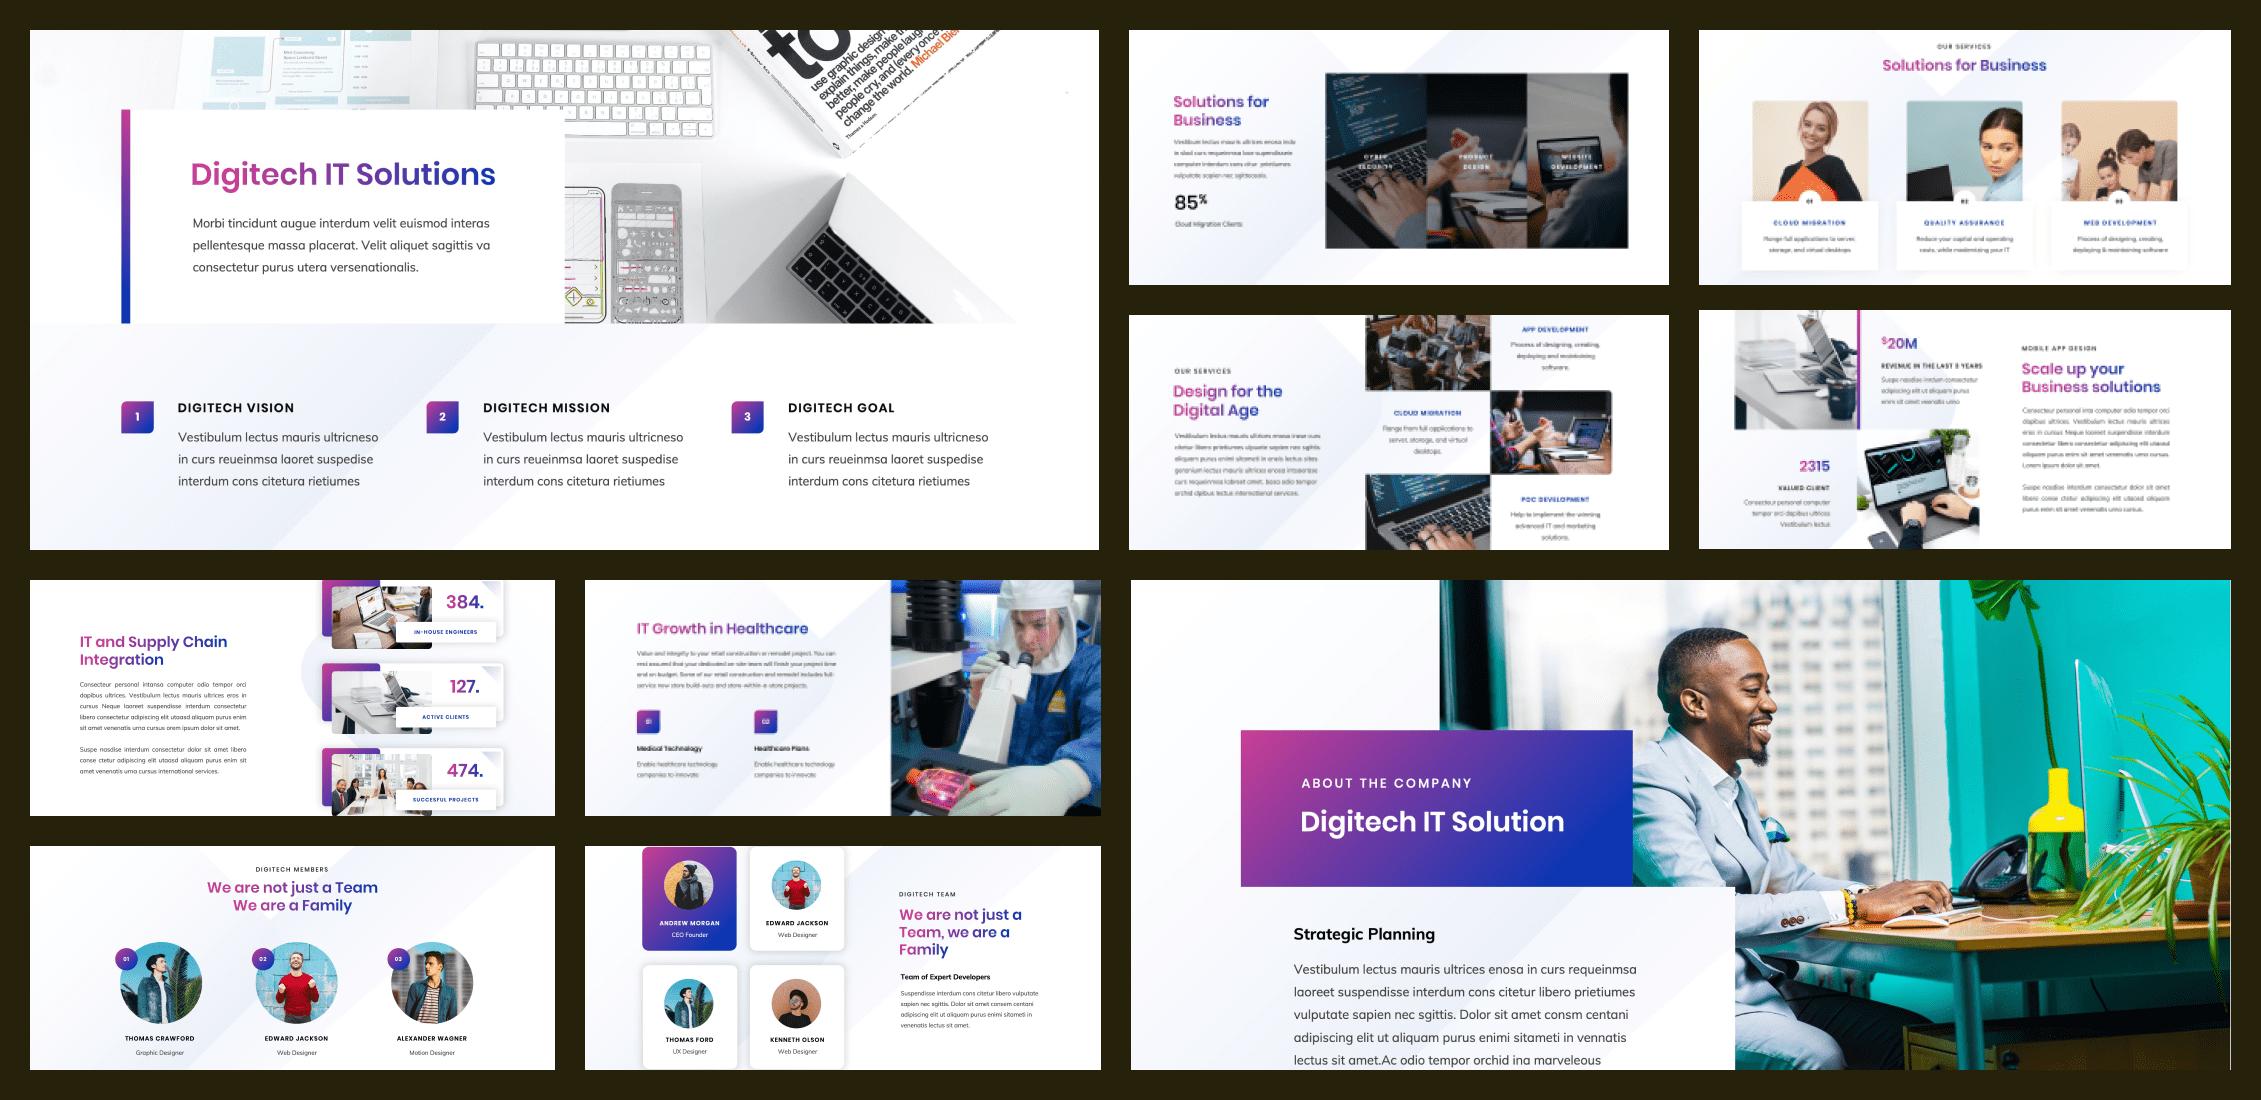 50+ Free and Premium Simple Google Slides Themes in 2021 - simple google slides theme 35